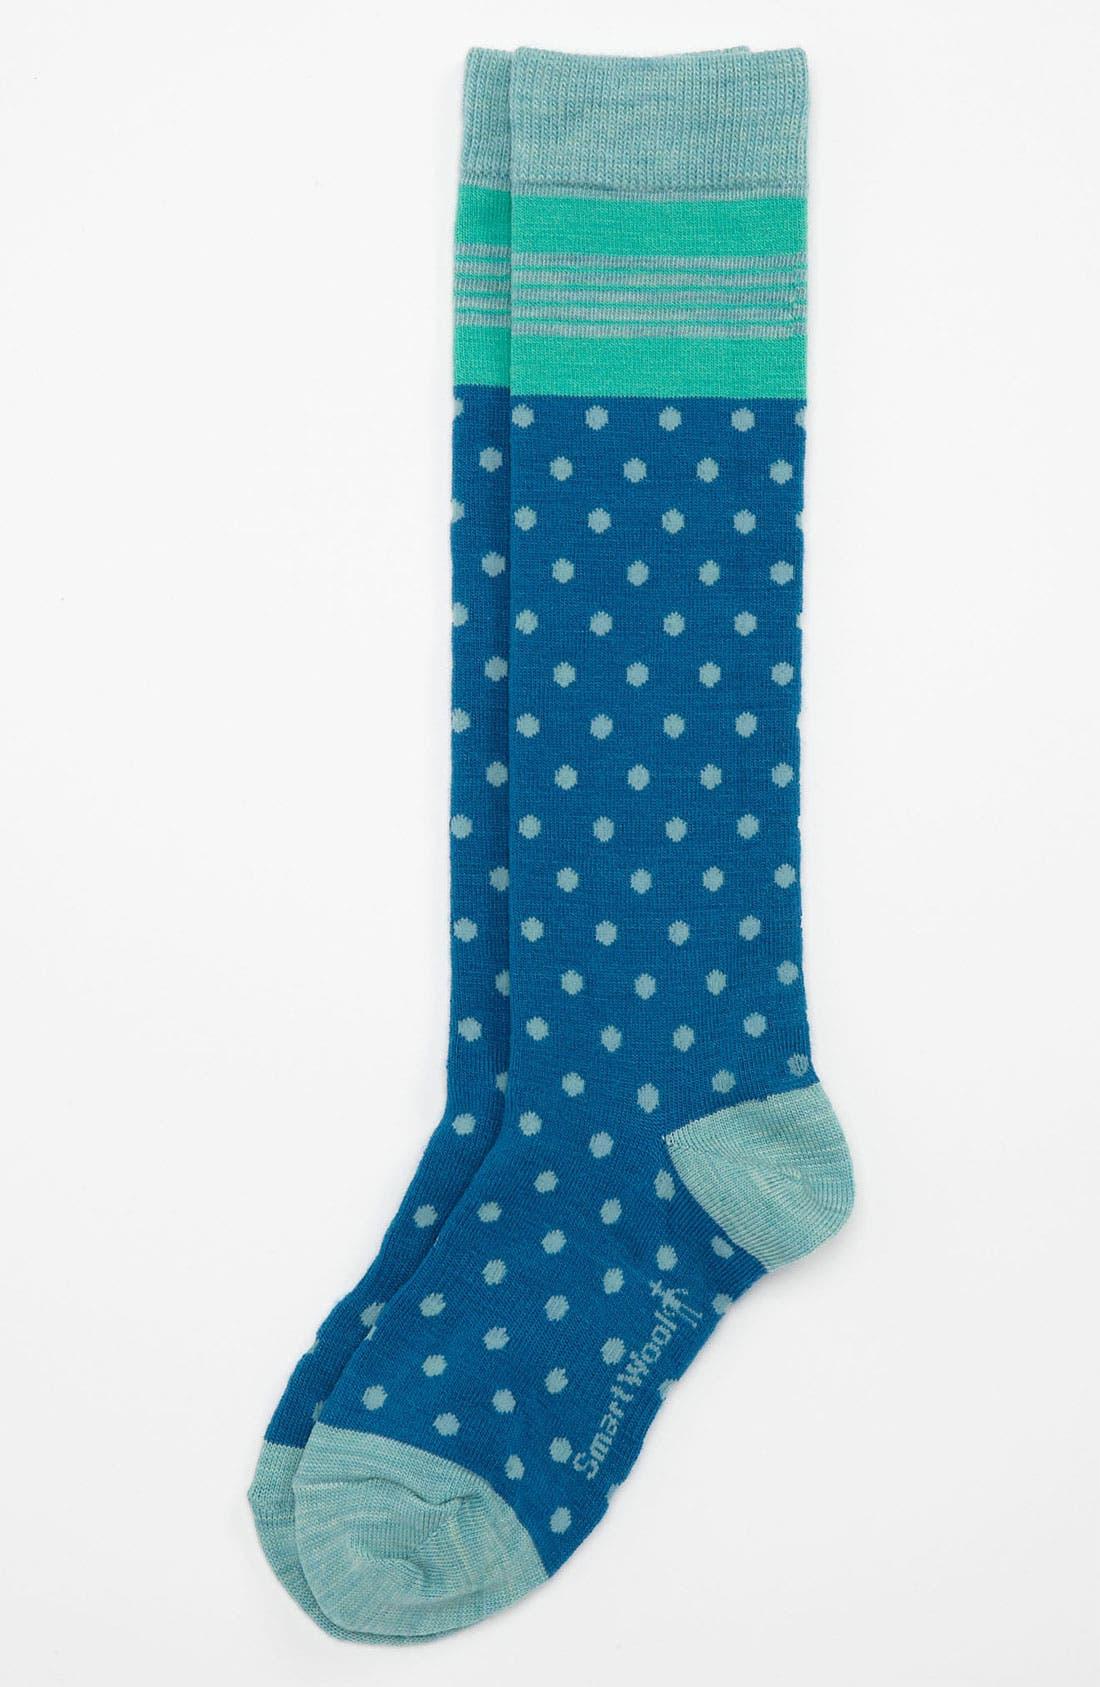 Alternate Image 1 Selected - Smartwool 'Oui Mademoiselle' Knee Socks (Little Girls & Big Girls)